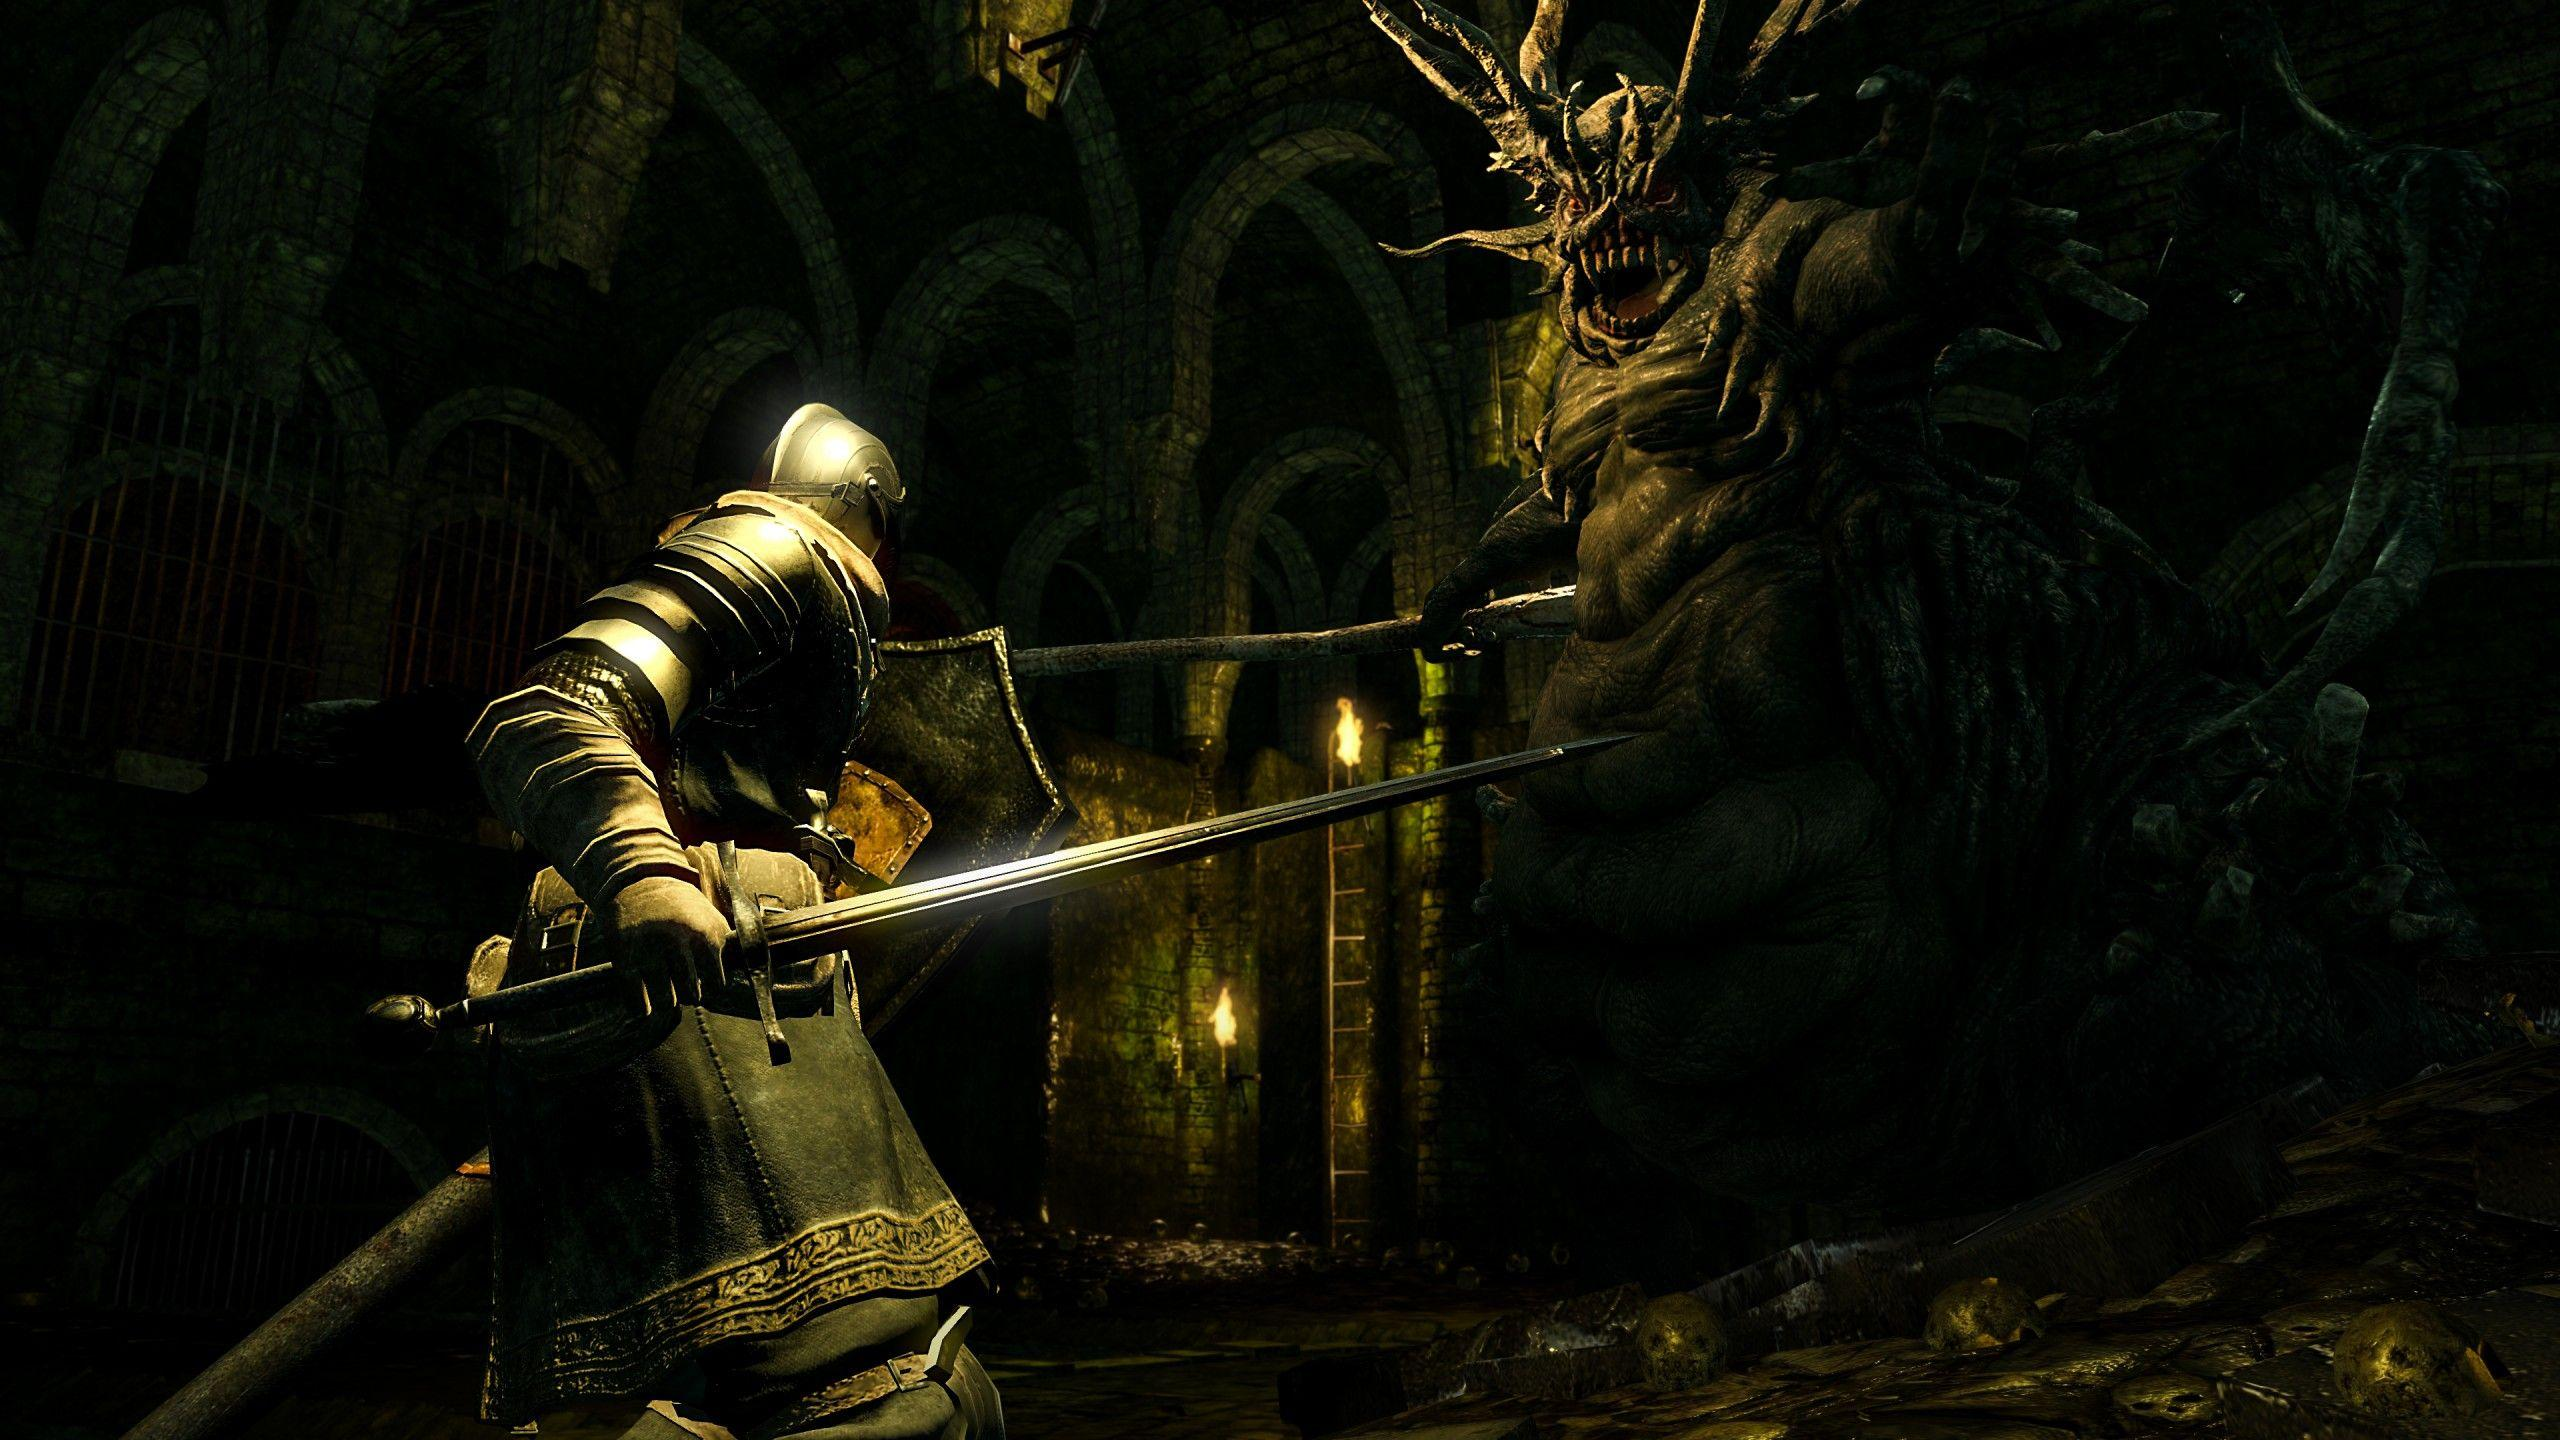 Dark Souls Remastered Wallpapers - Wallpaper Cave